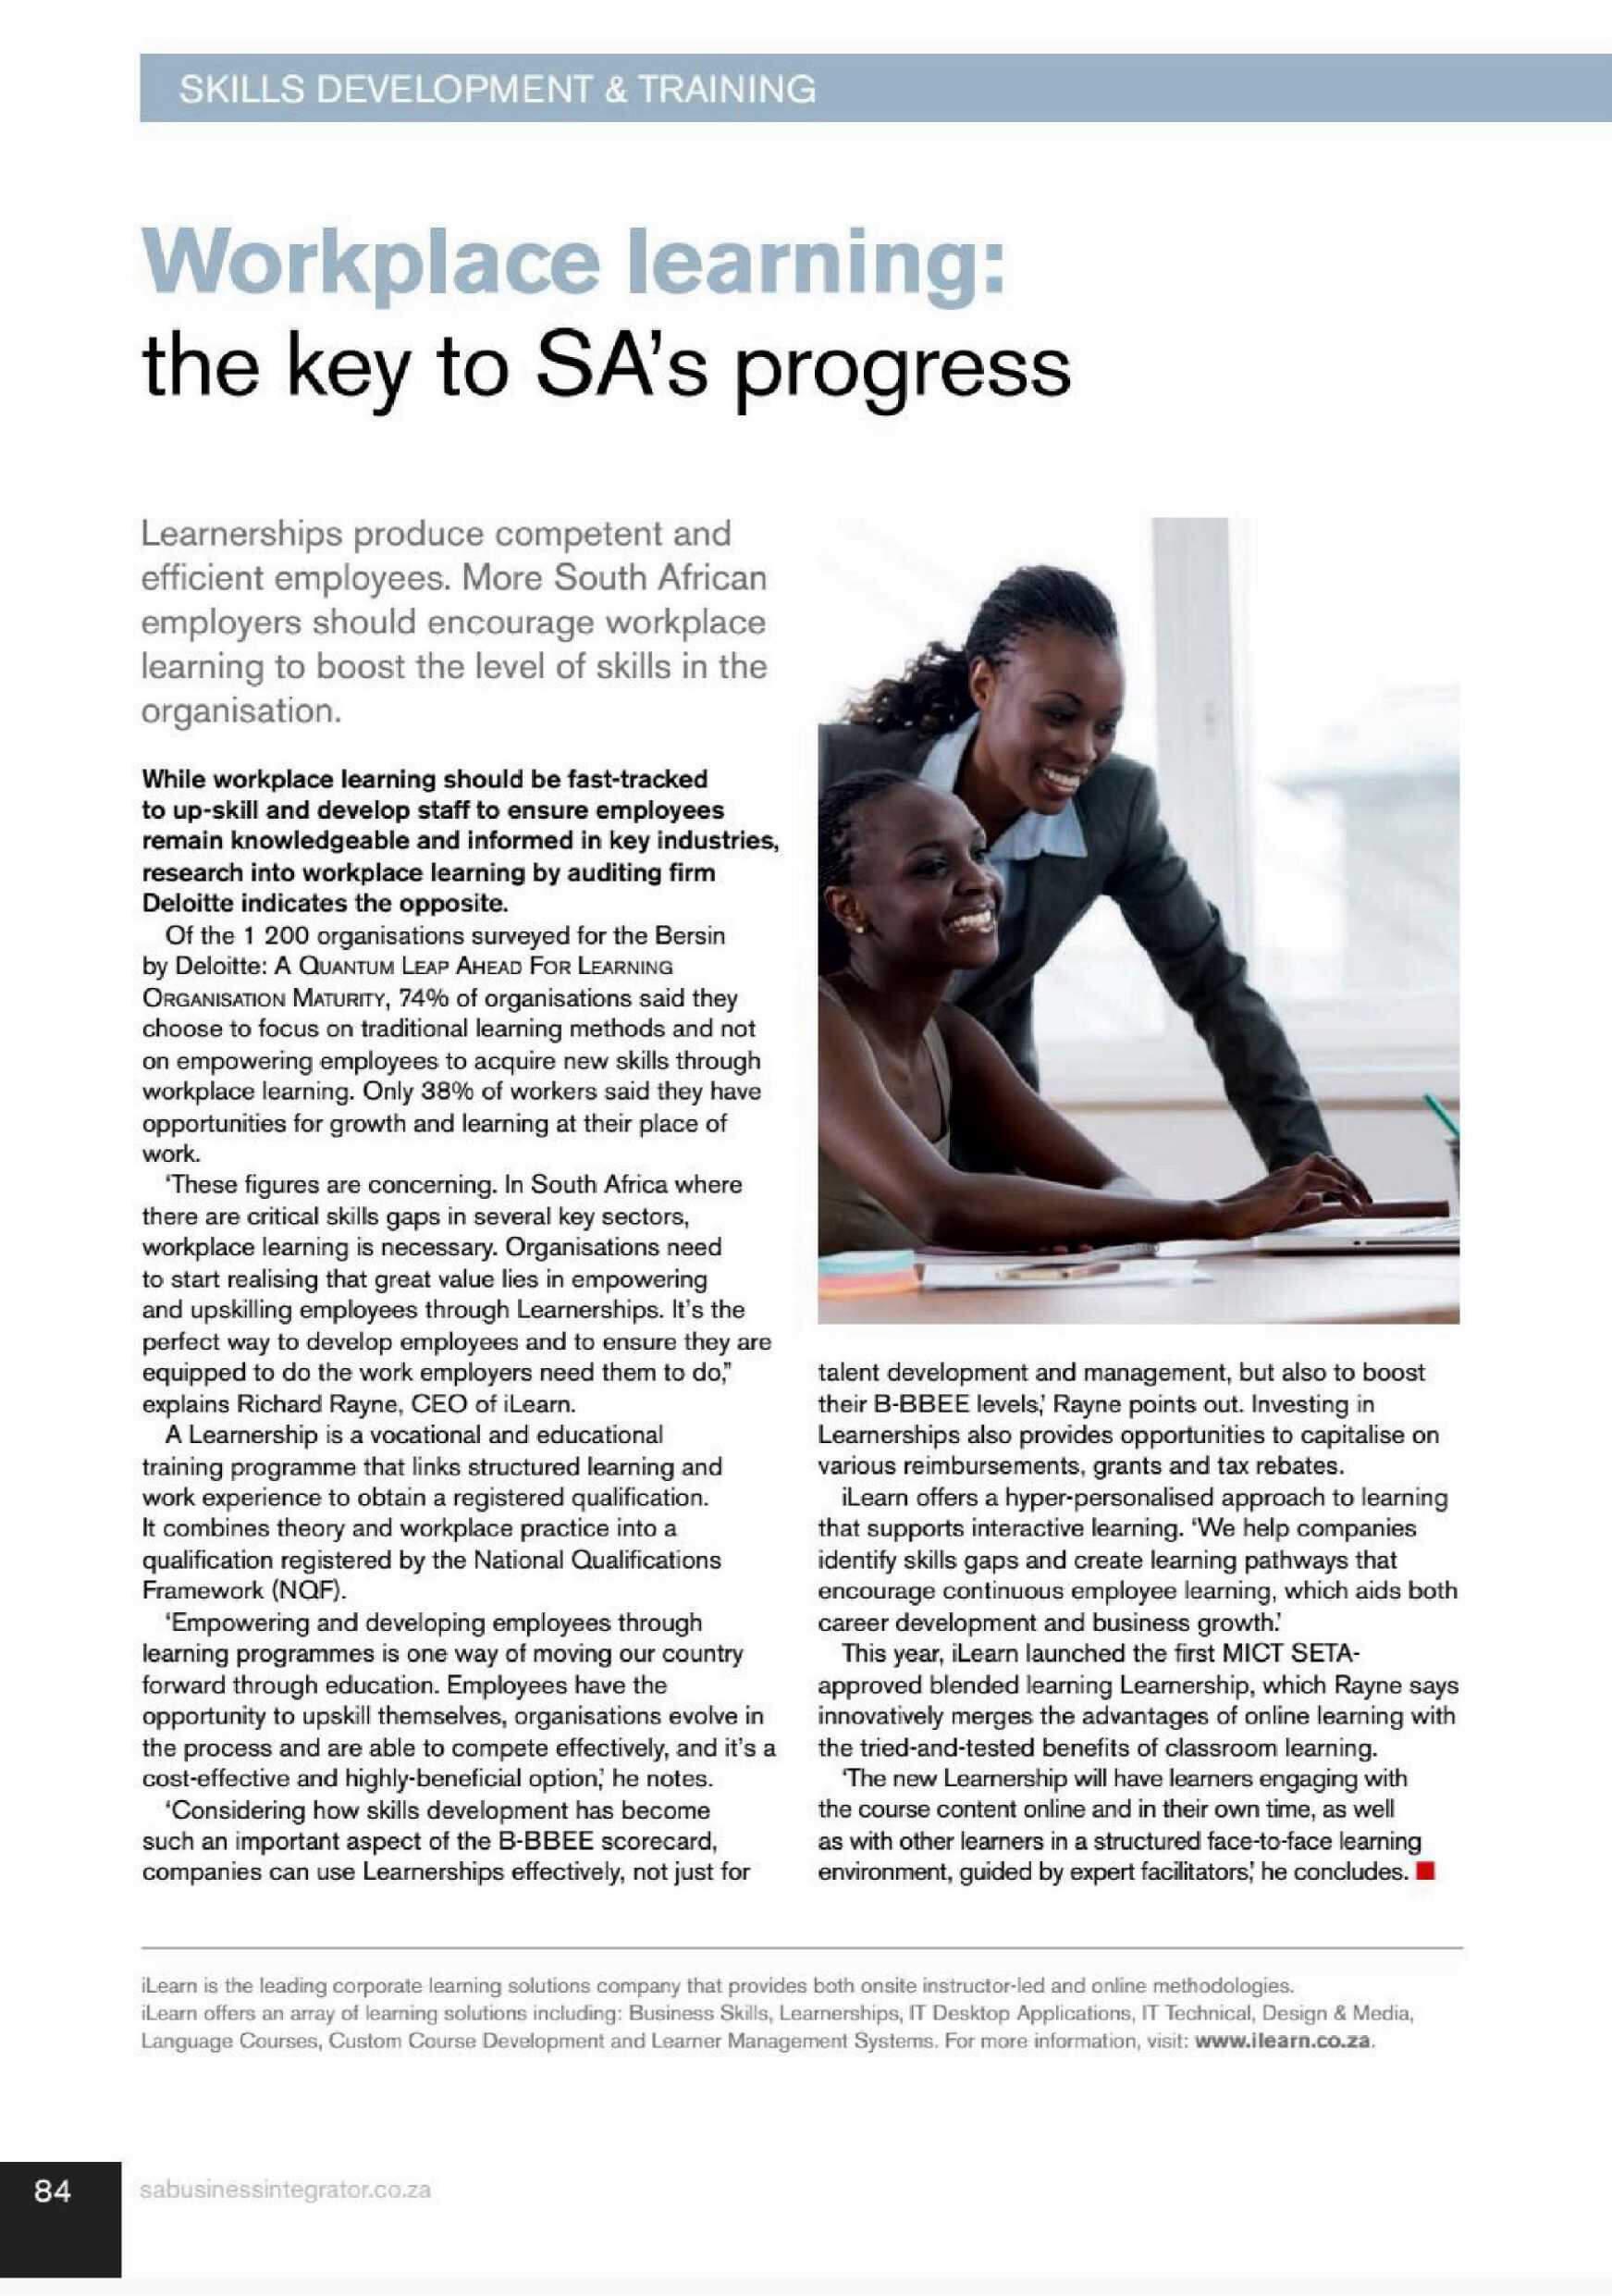 06 WORKPLACE LEARNING- THE KEY TO SAS PROGRESS_ilearn3